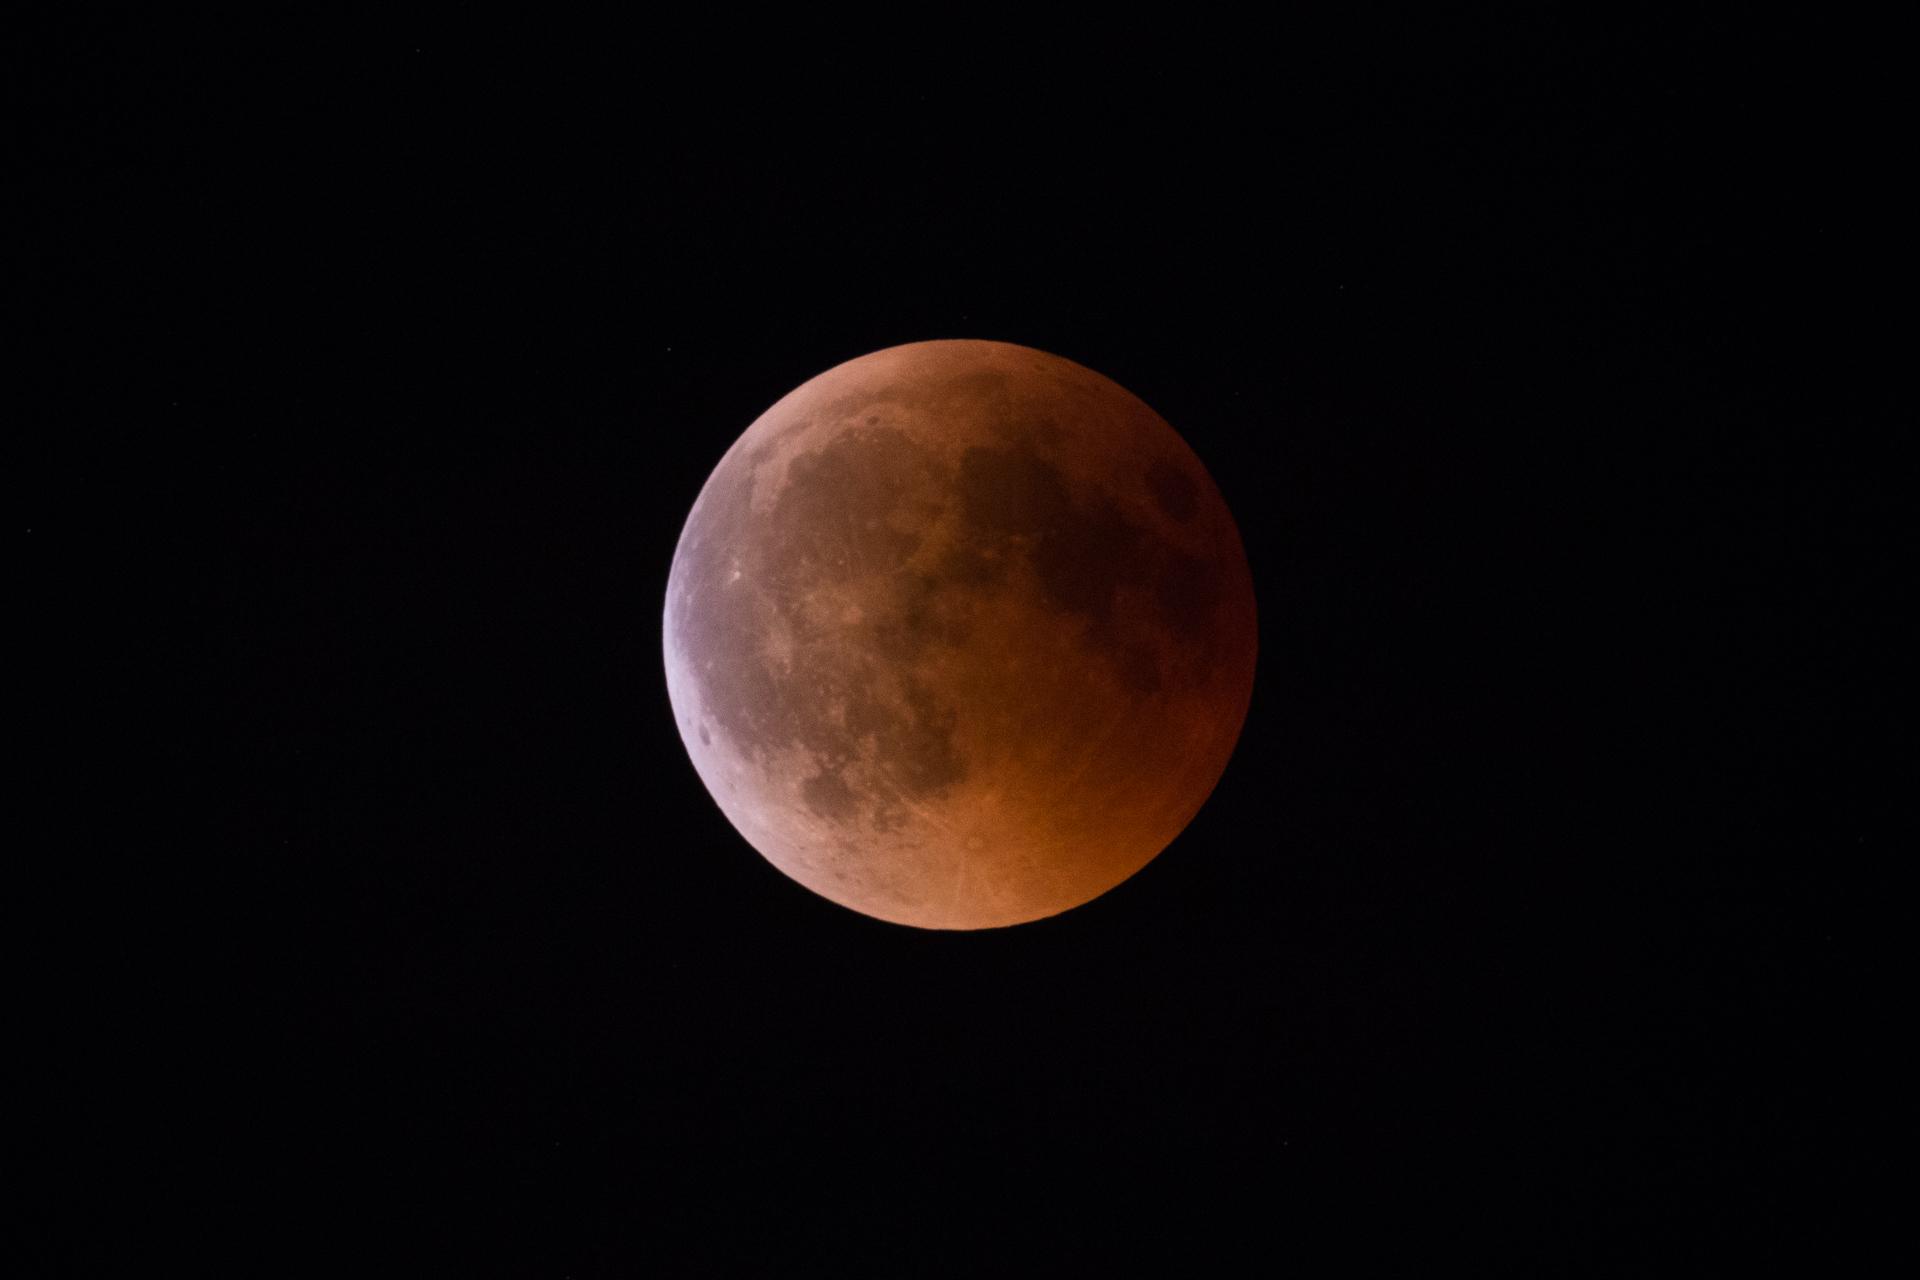 20180727_LunarEclipse-4